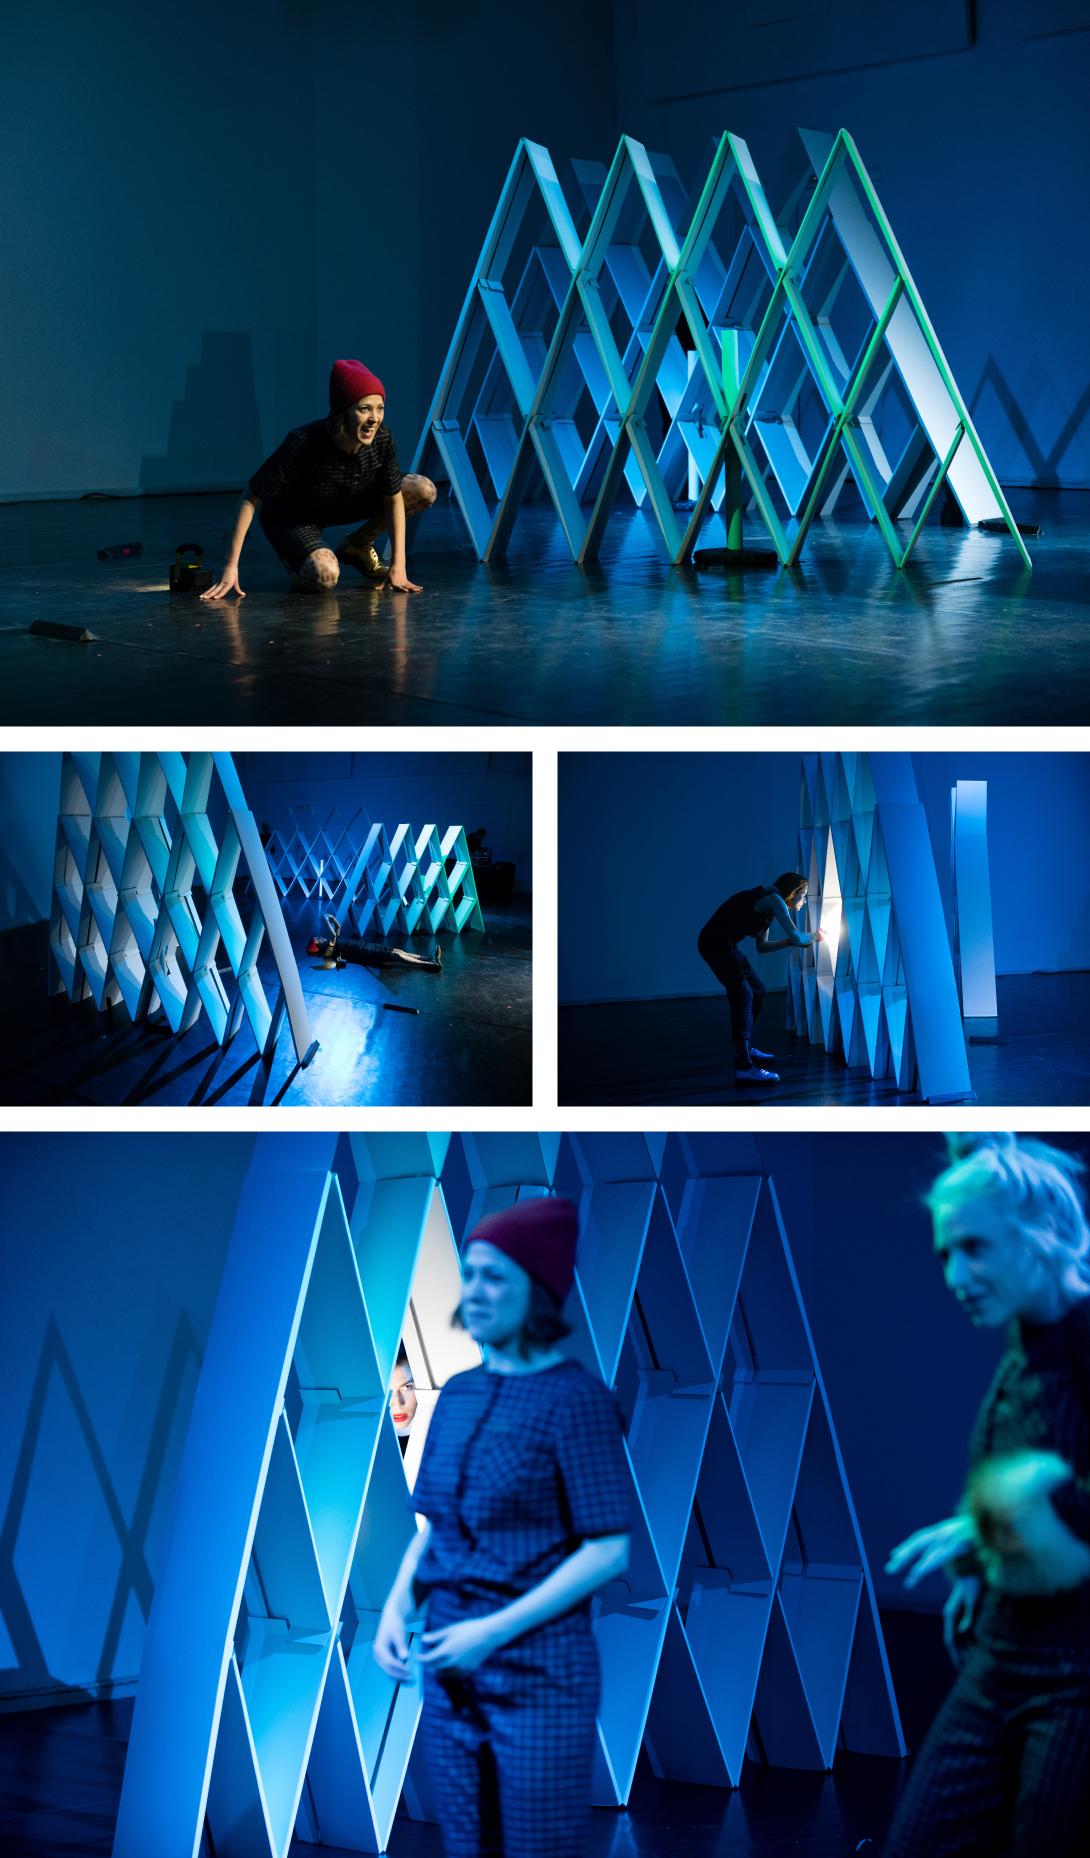 claudia berta_guggi_genger_club3_stage-design_02